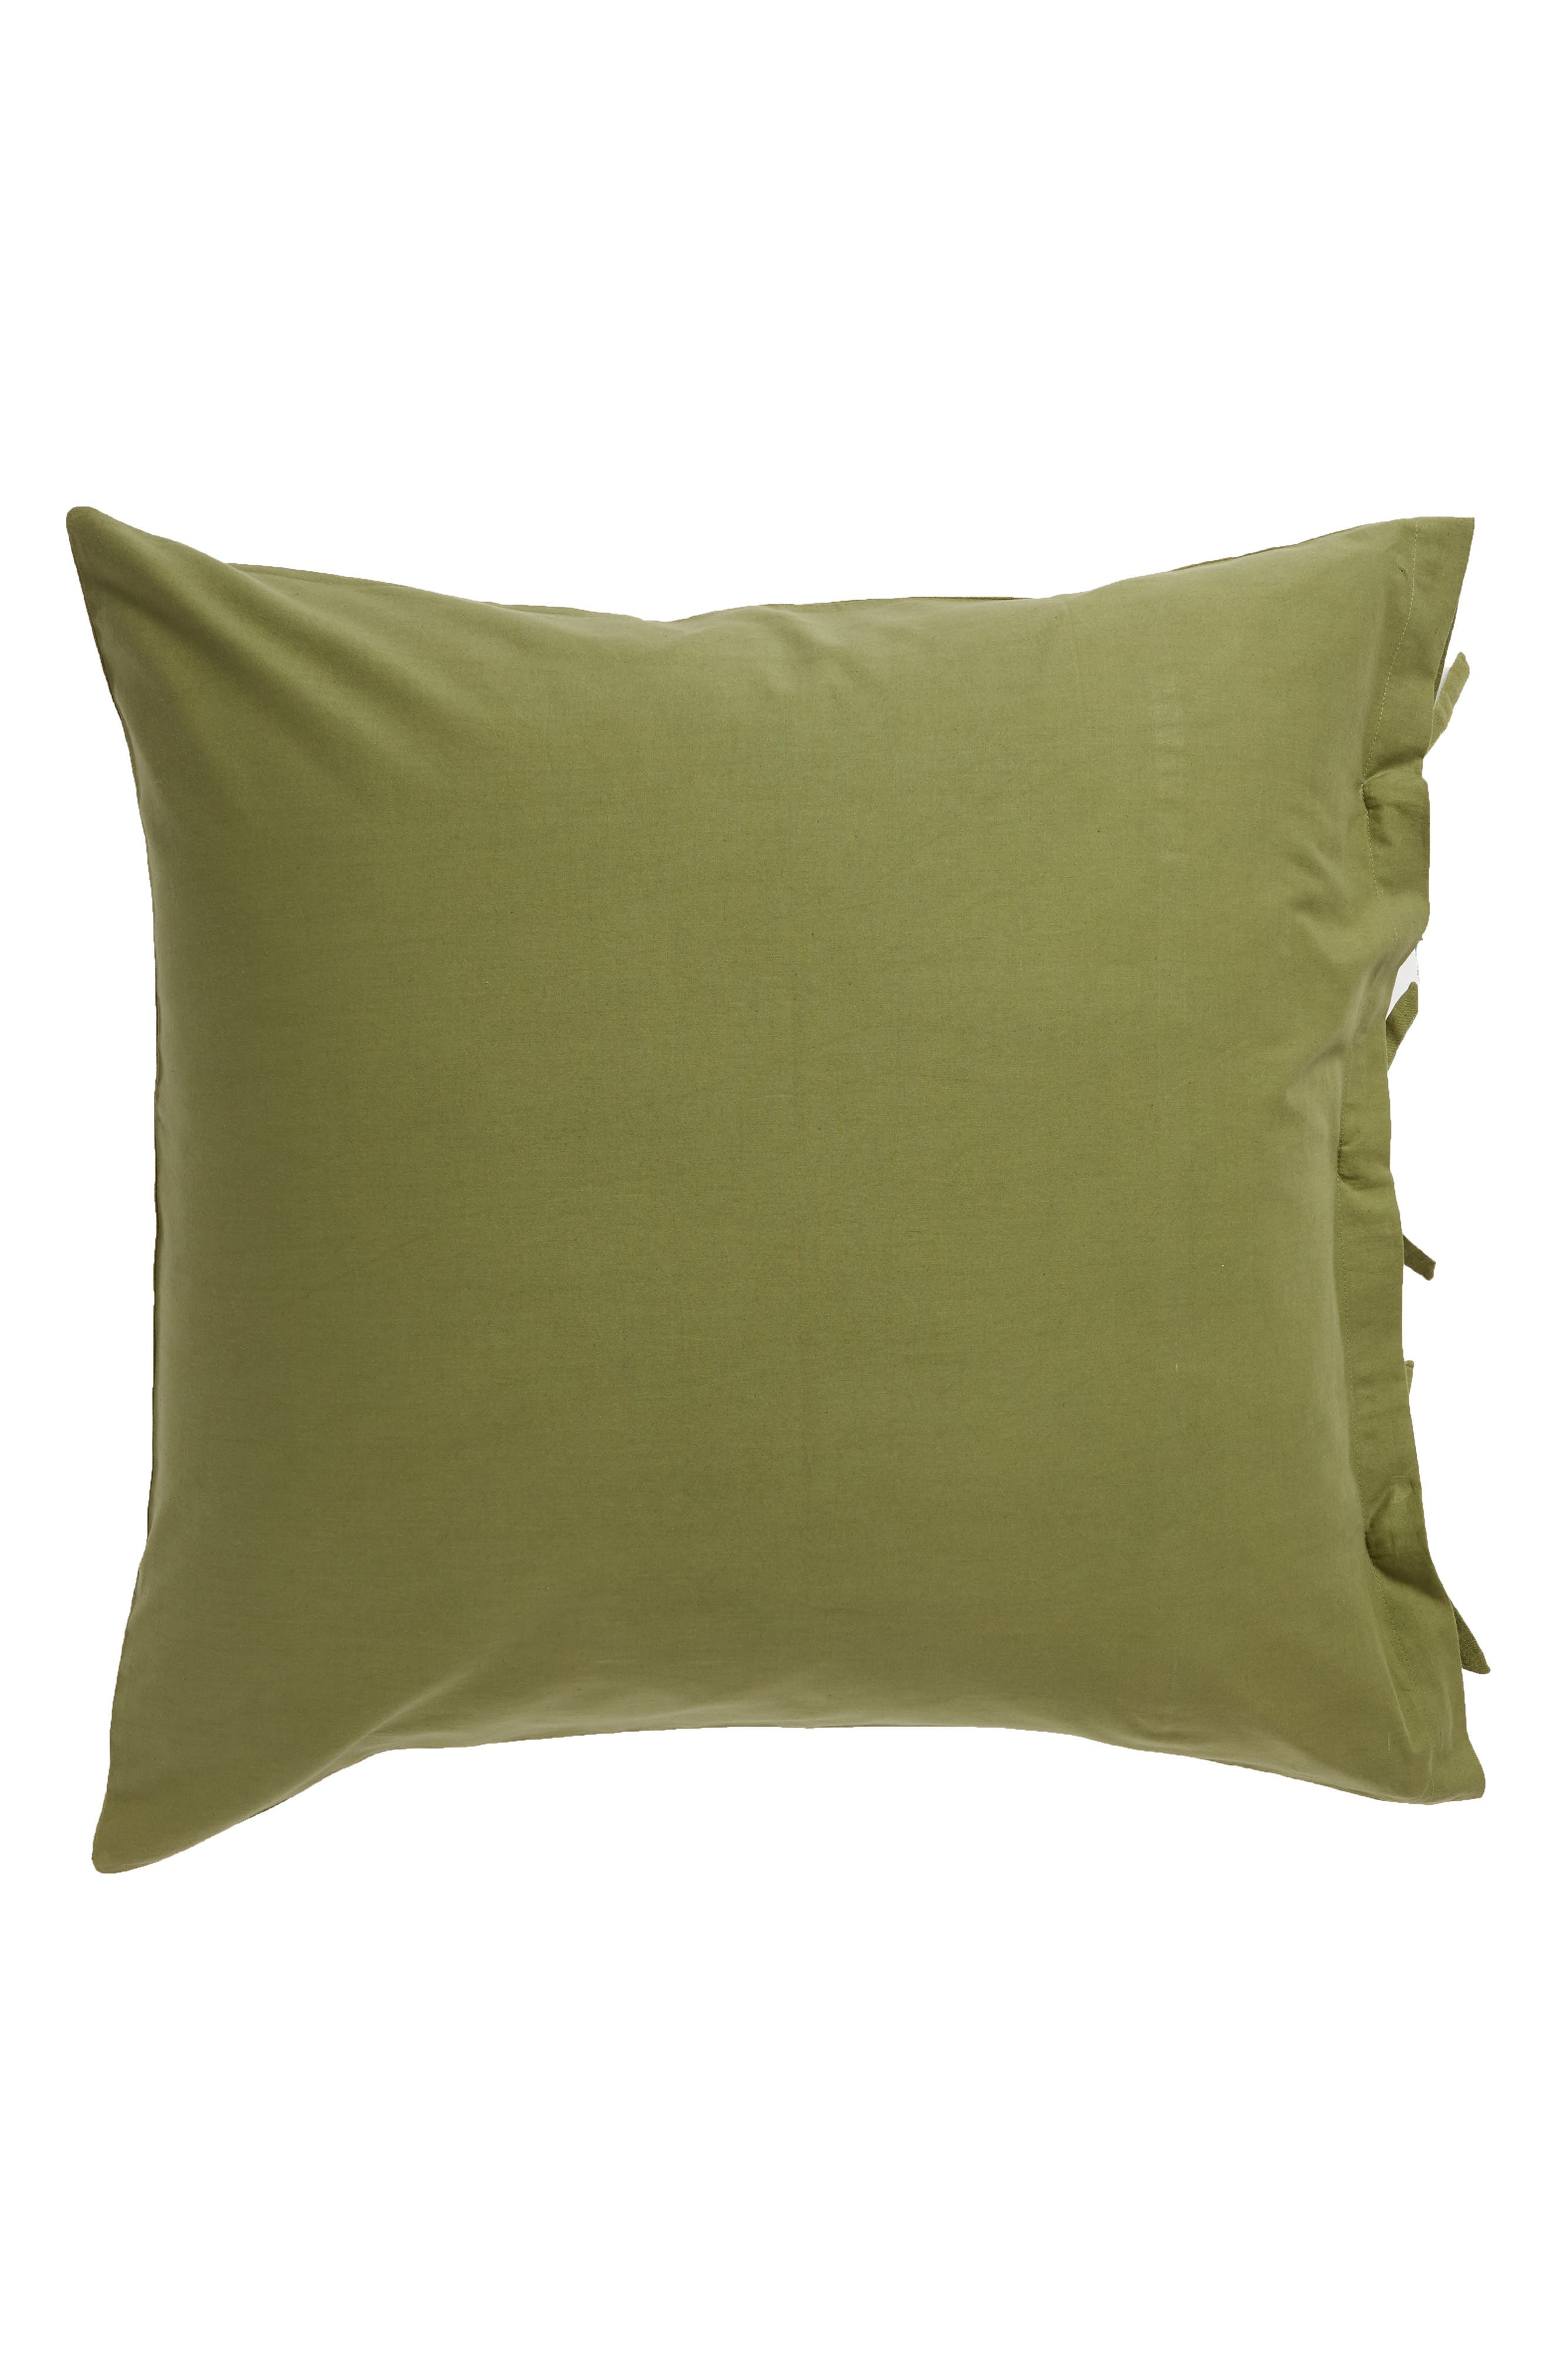 TREASURE & BOND, Relaxed Cotton & Linen Euro Sham, Alternate thumbnail 2, color, OLIVE SPICE